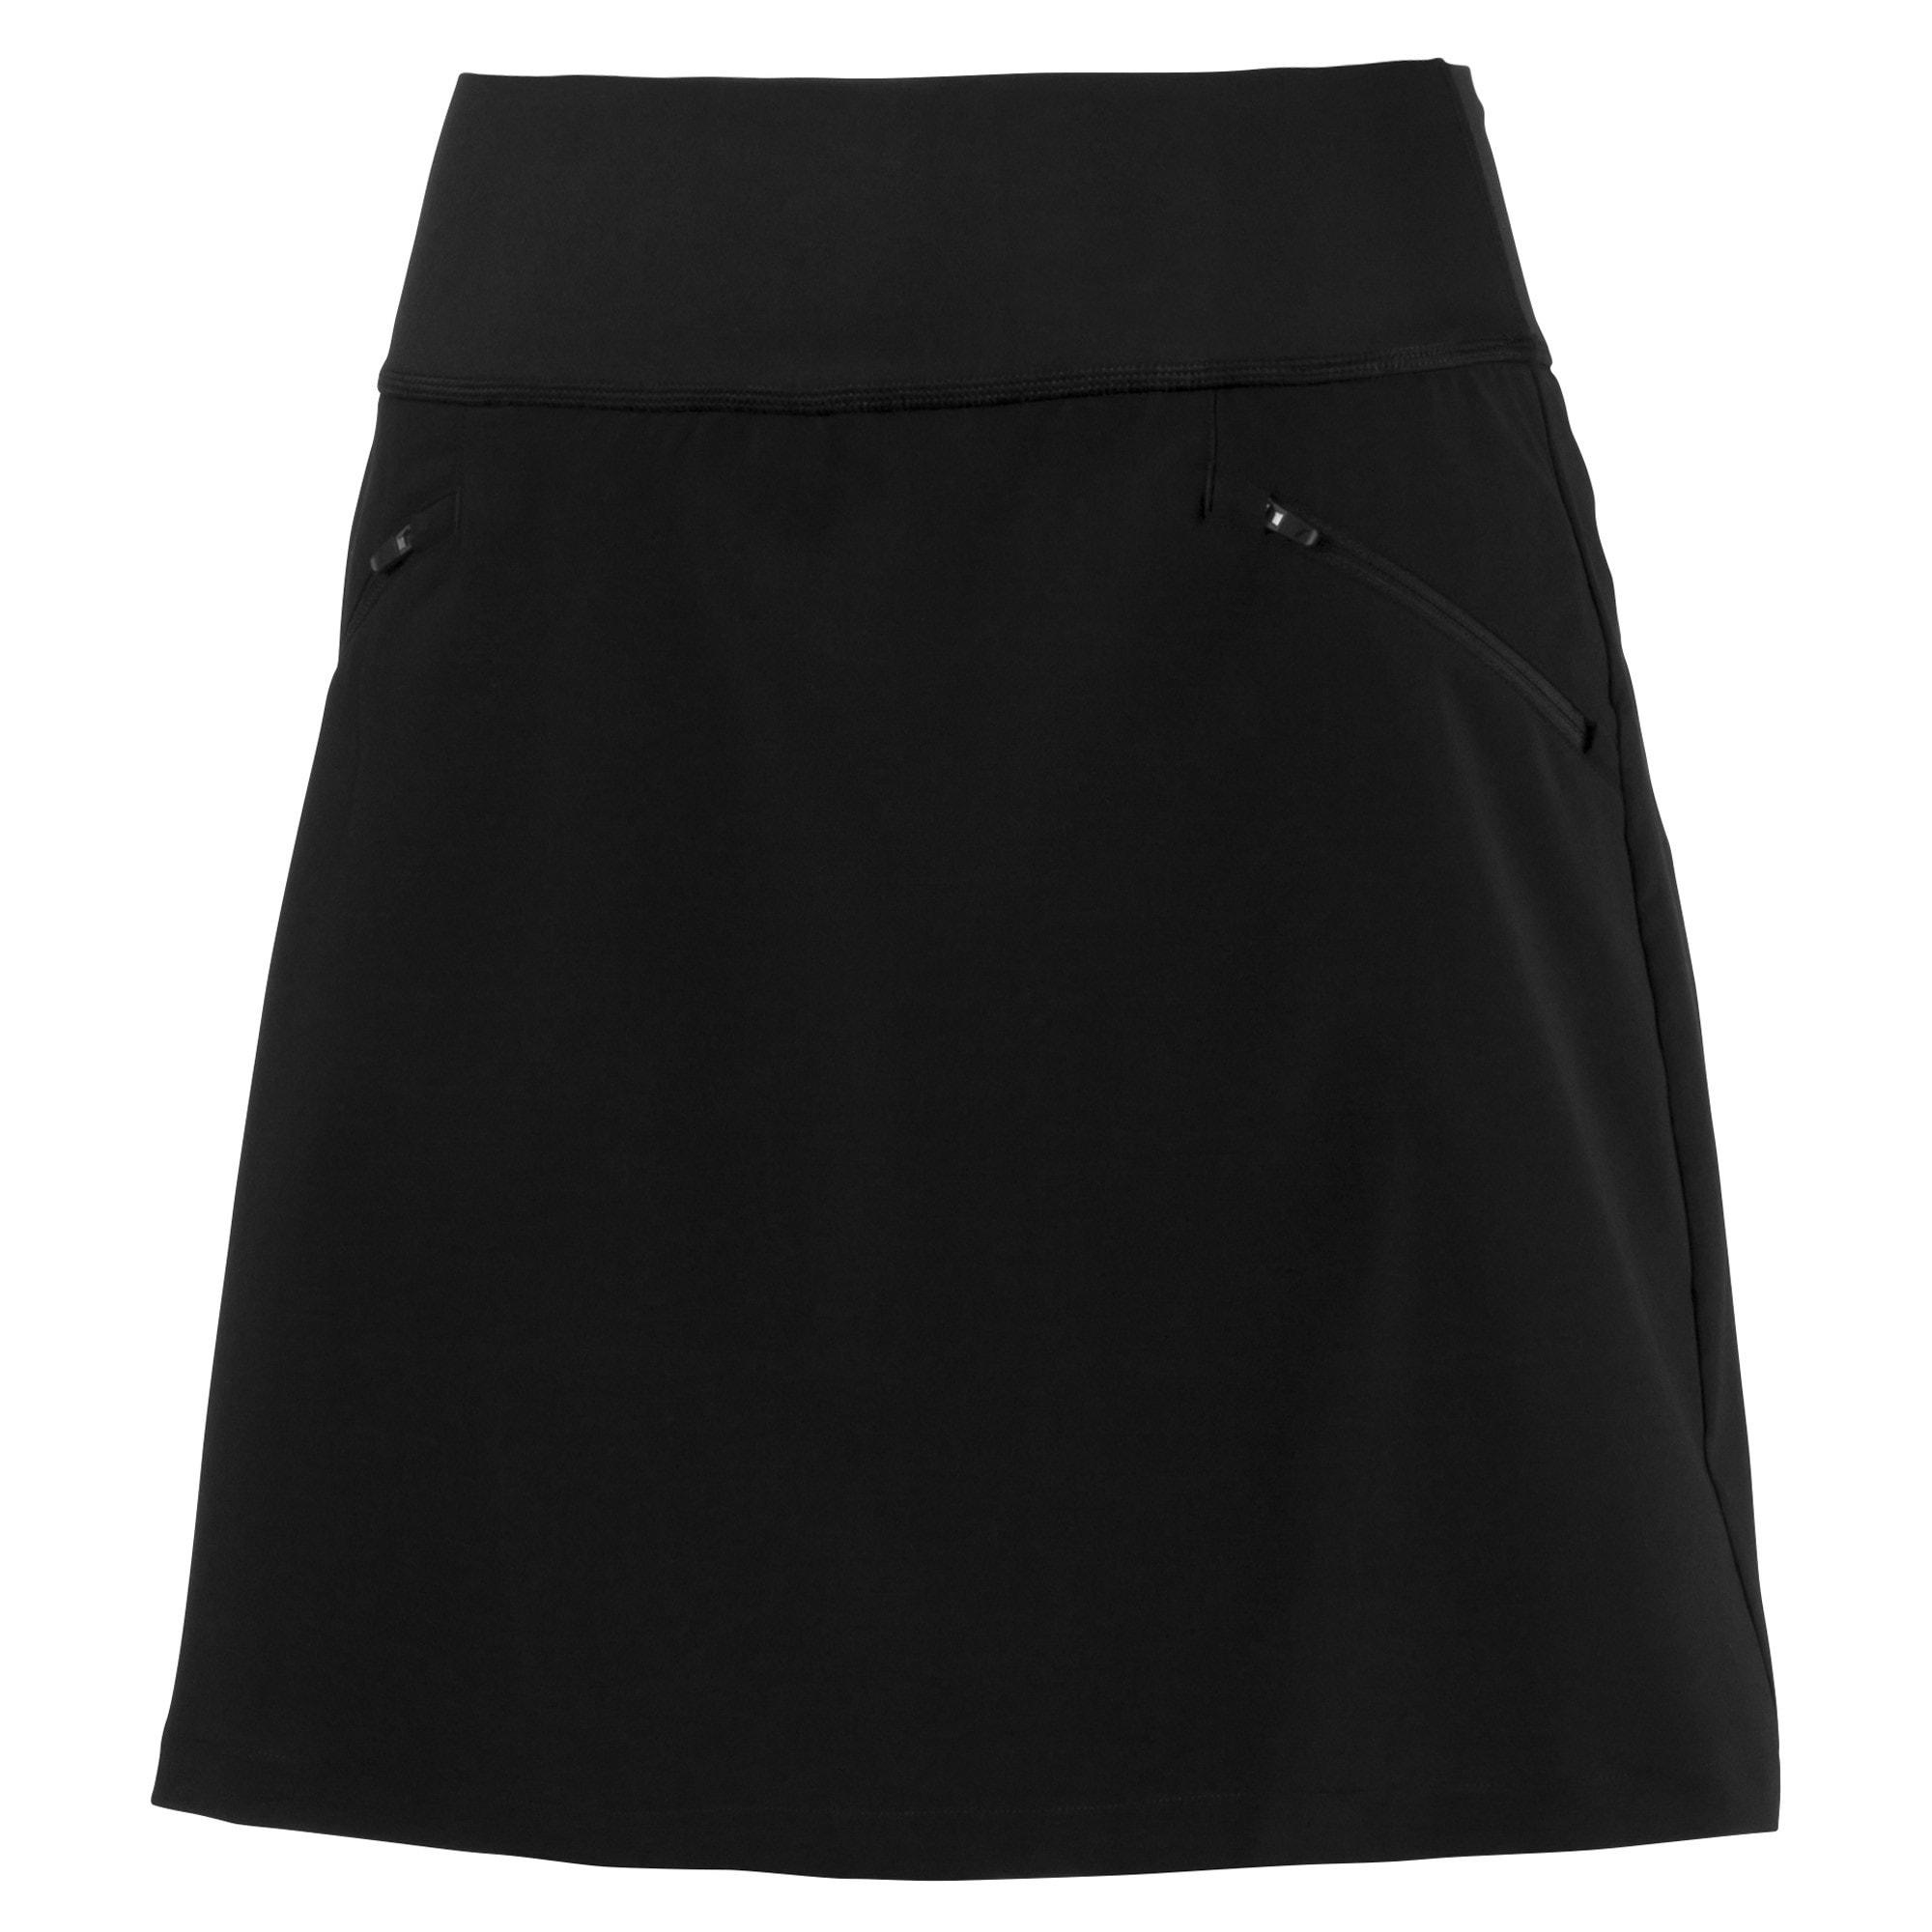 Thumbnail 1 of PWRSHAPE 18 Inch Women's Golf Skirt, Puma Black, medium